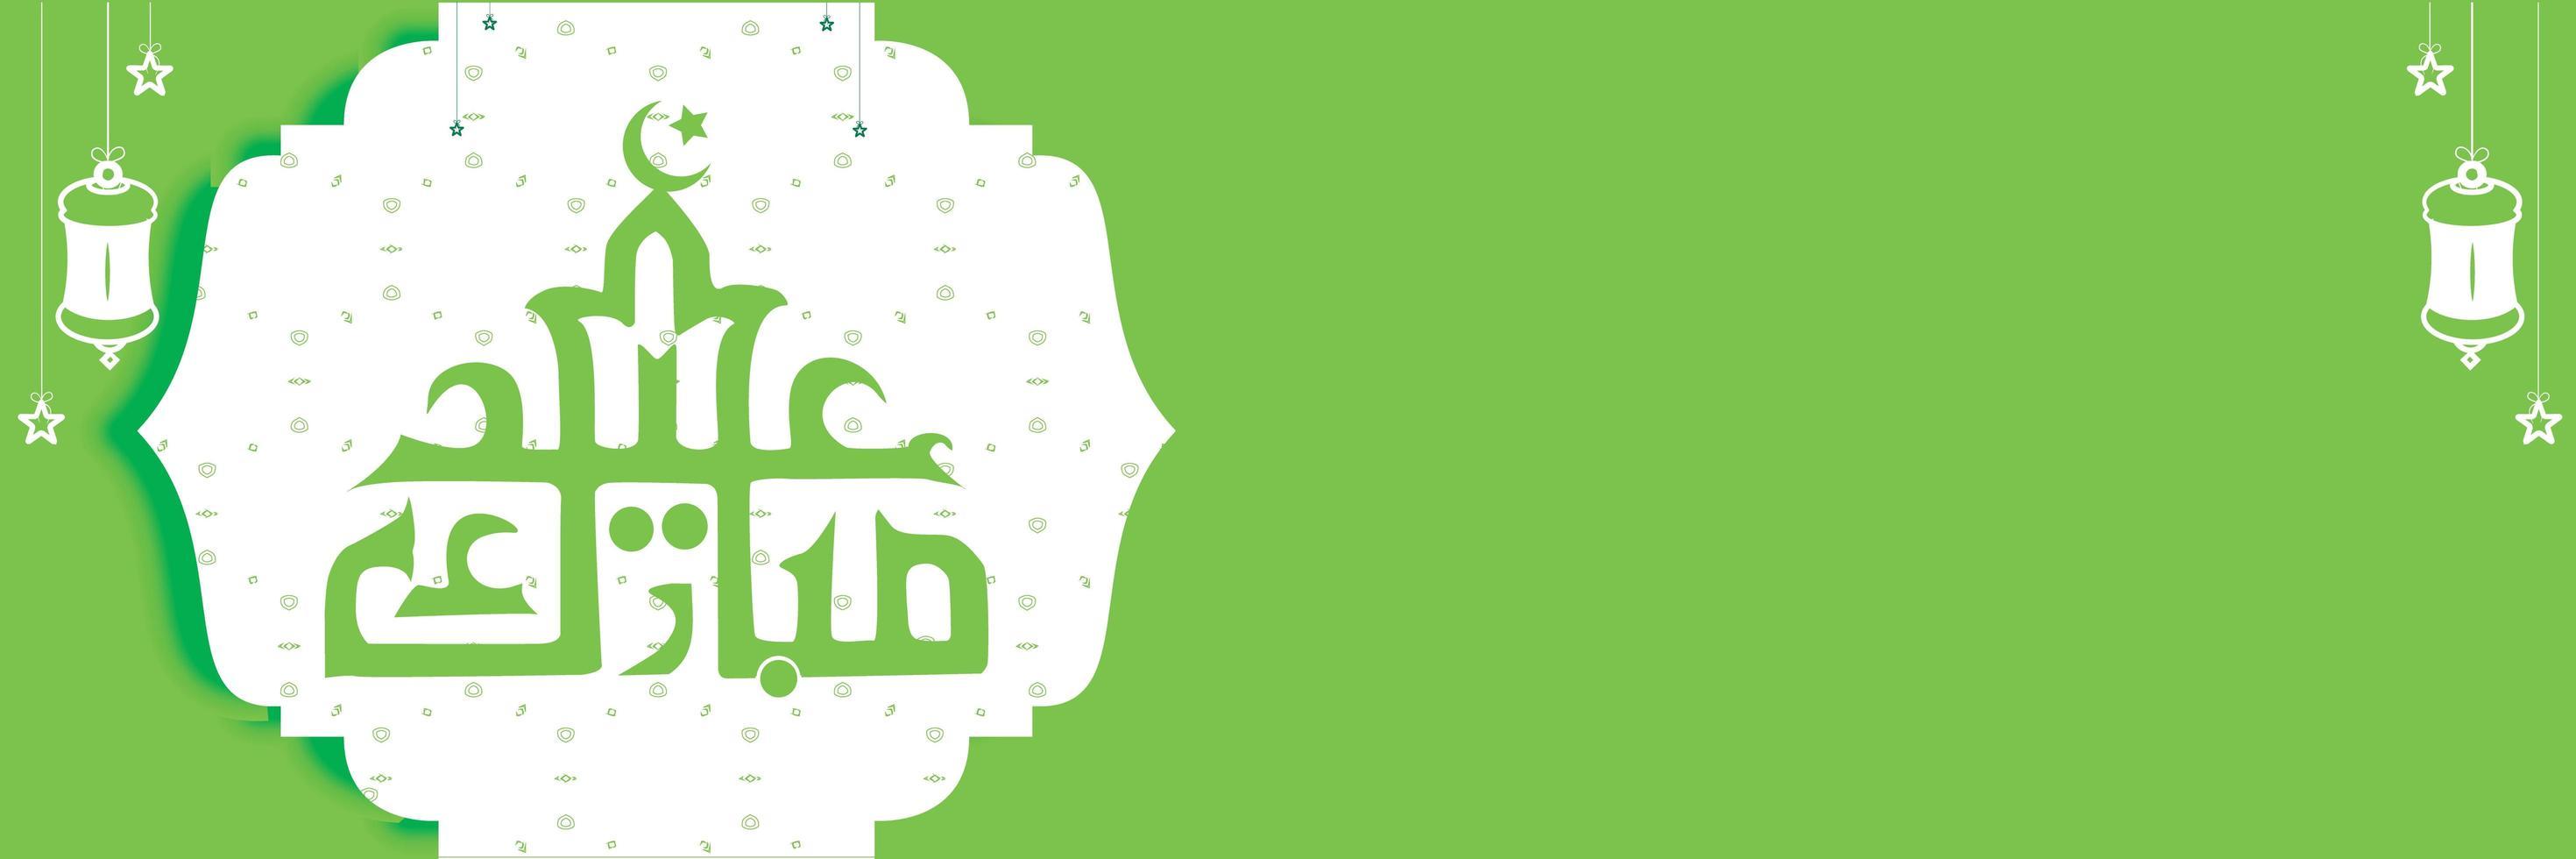 Eid Mubarak design banner with green background color vector